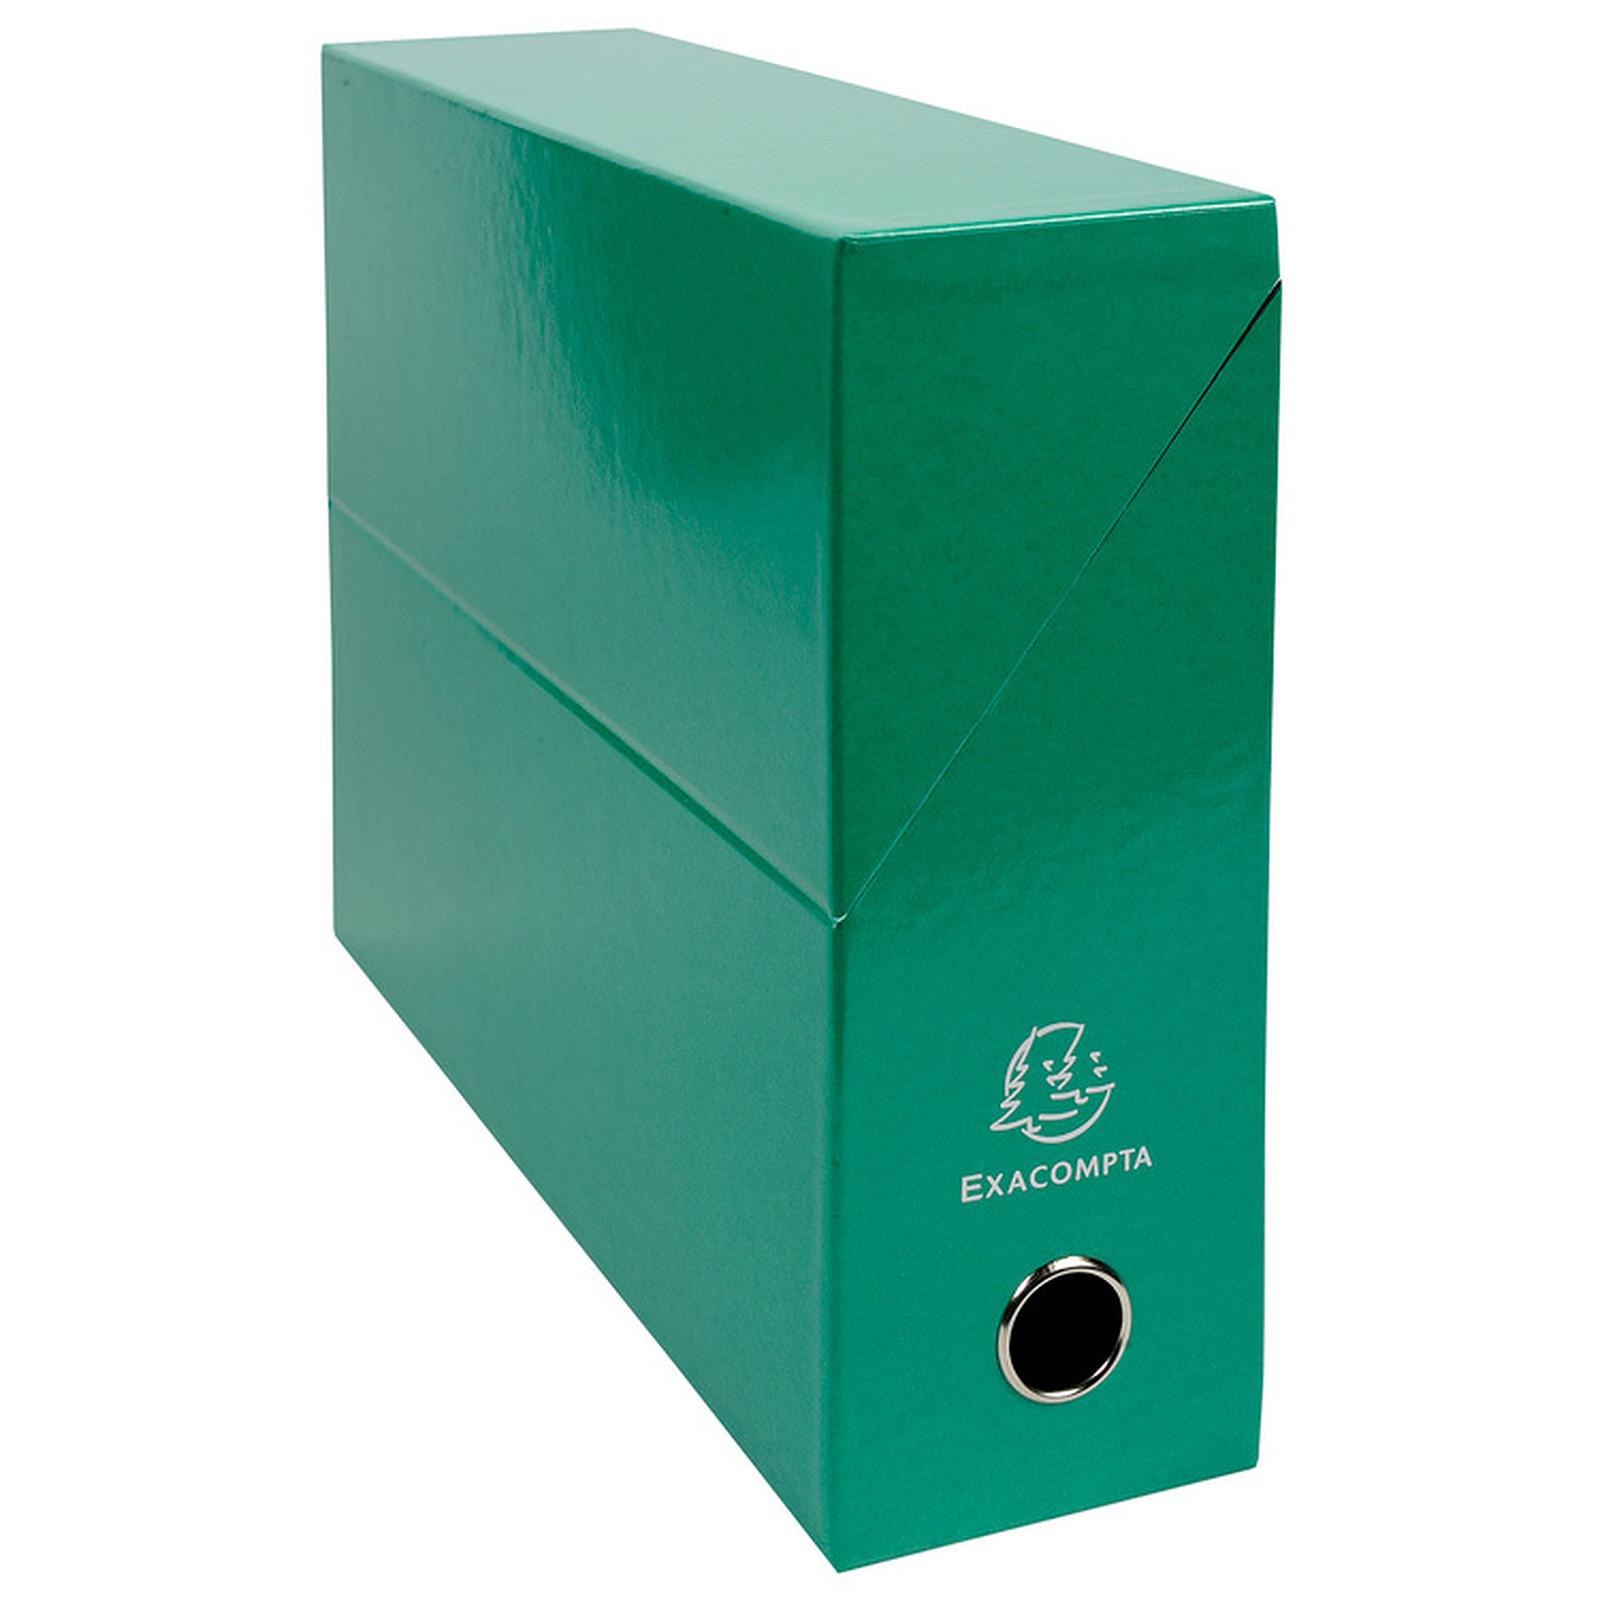 Exacompta Iderama Respaldo caja de transferencia laminada 90 mm verde oscuro